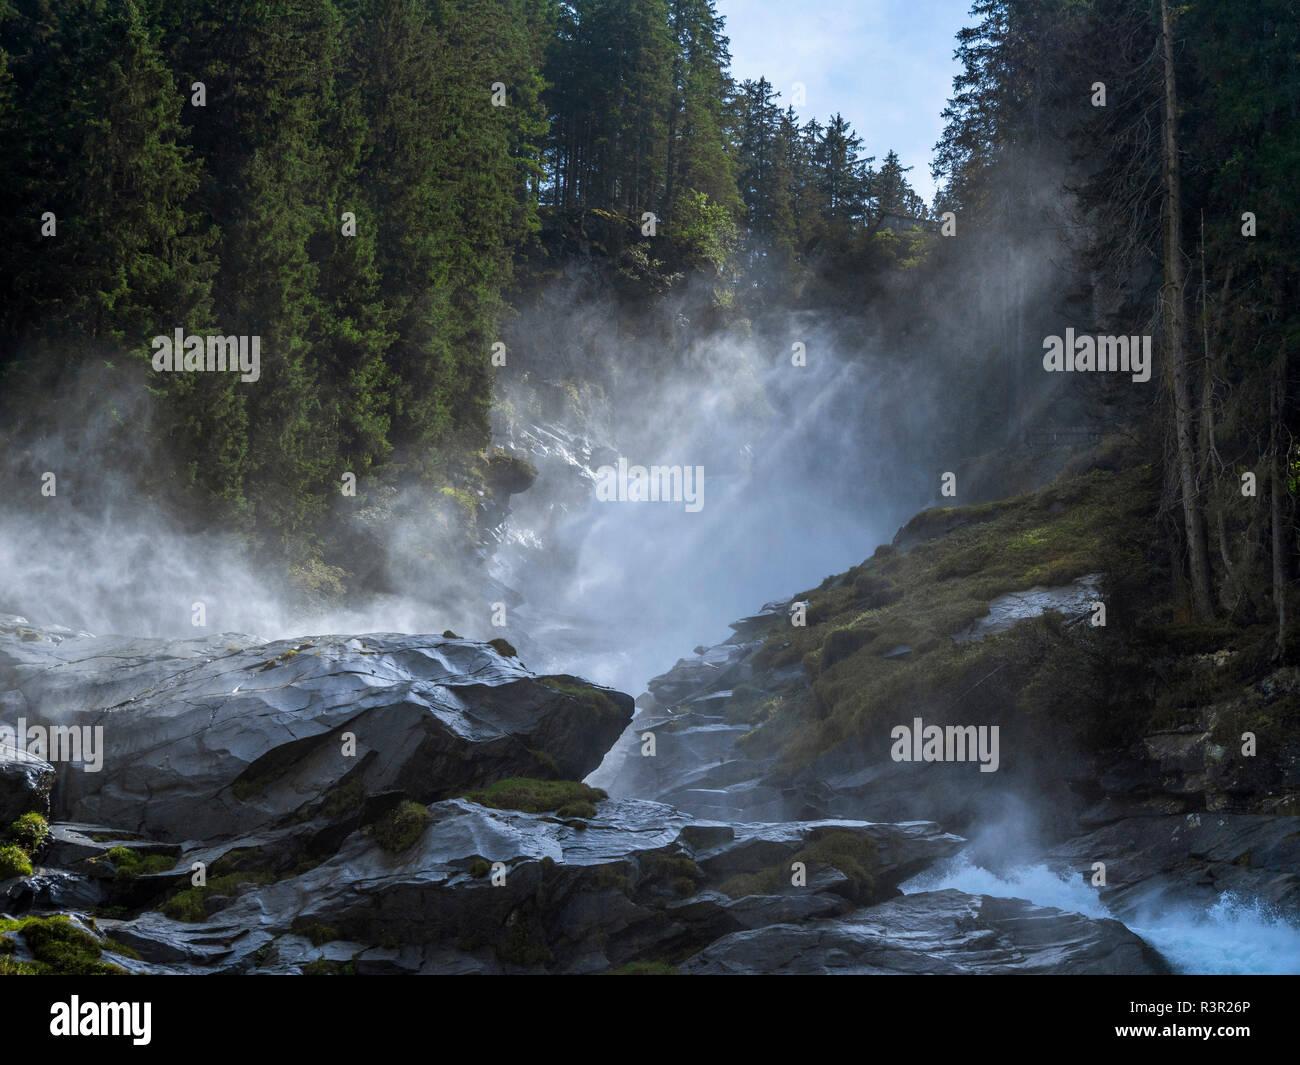 Krimmler Falls, Hohe Tauern National Park, Salzburger Land, Austria, Europe Stock Photo